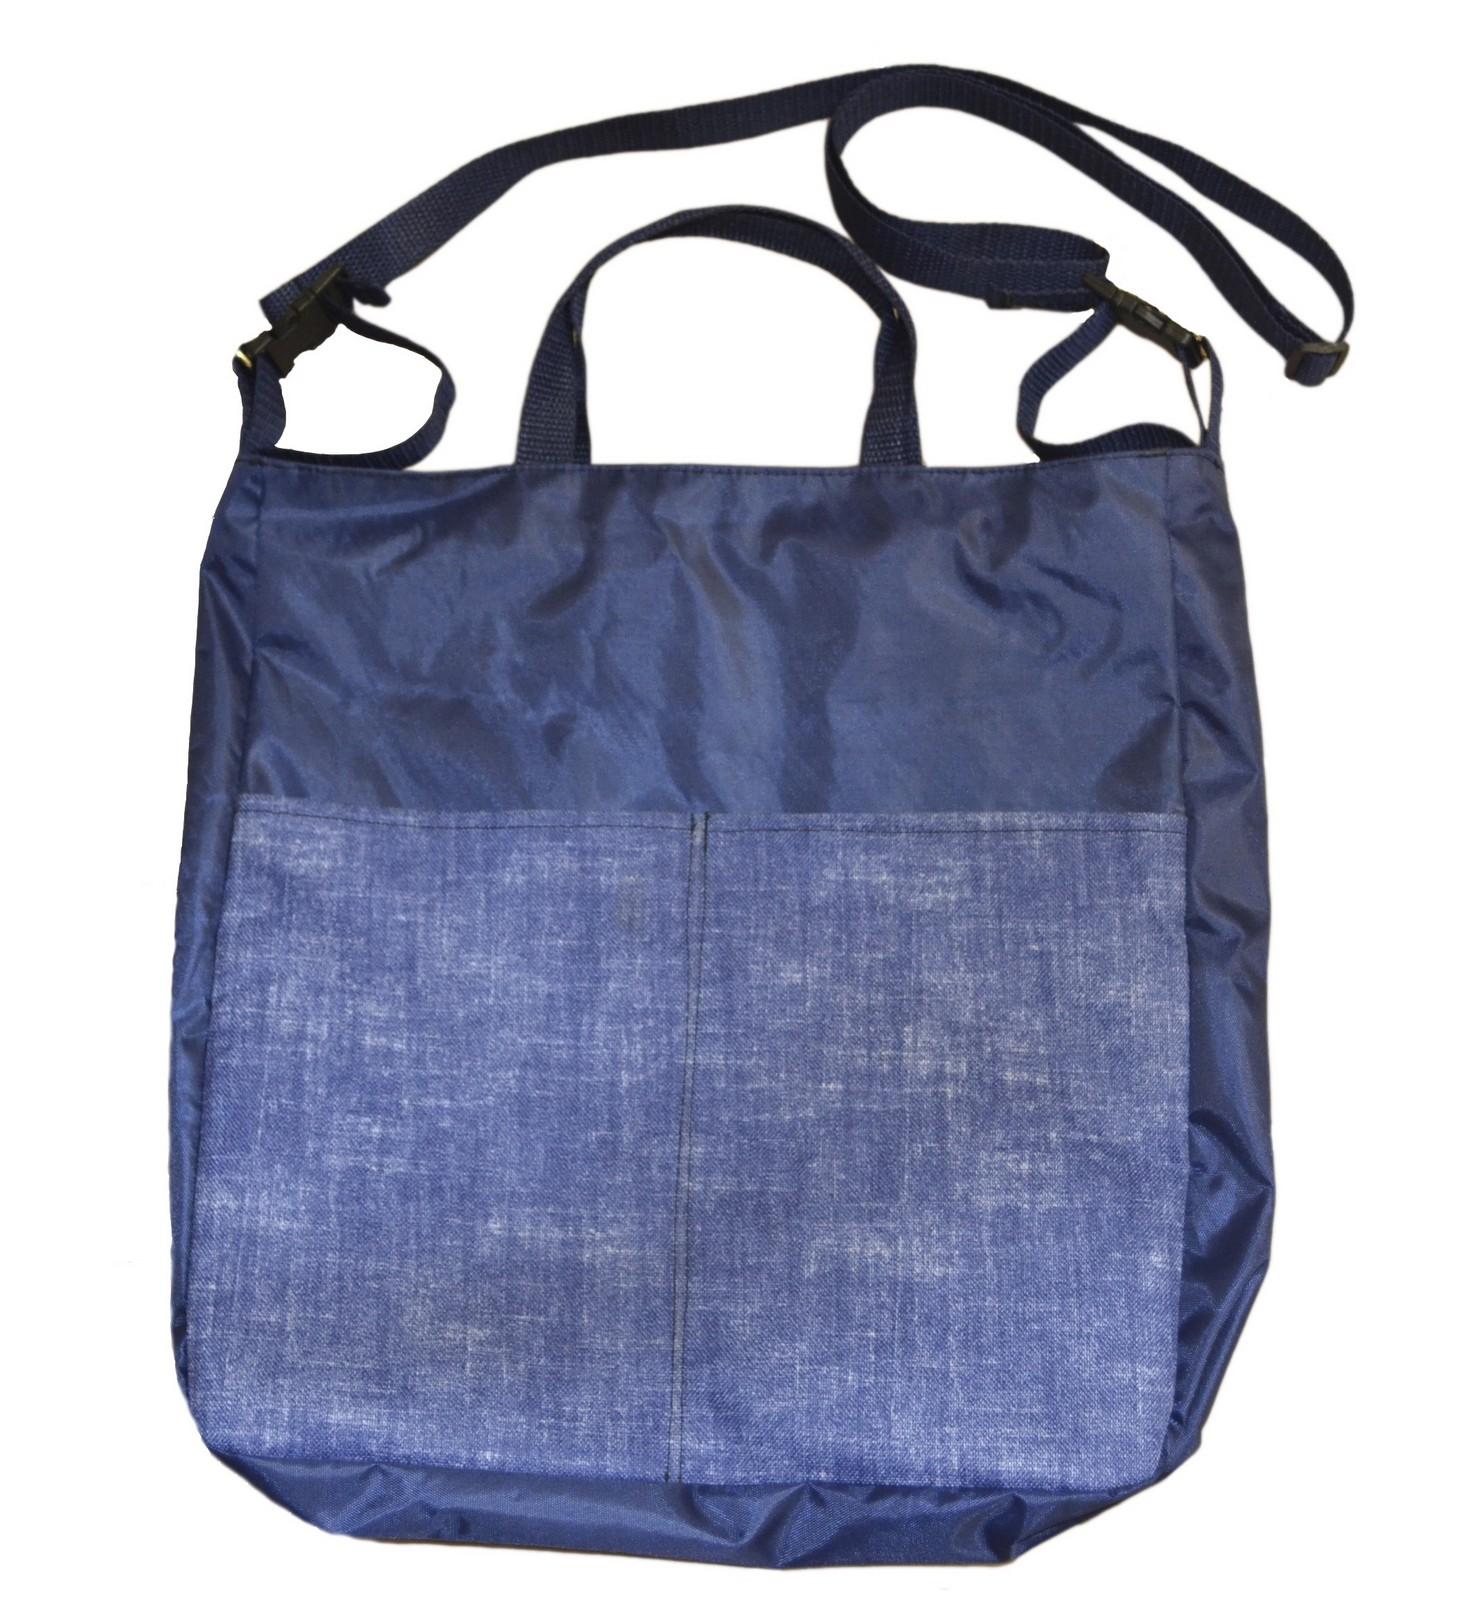 Органайзер-сумка для коляски Мирти, 4610003451776 недорого